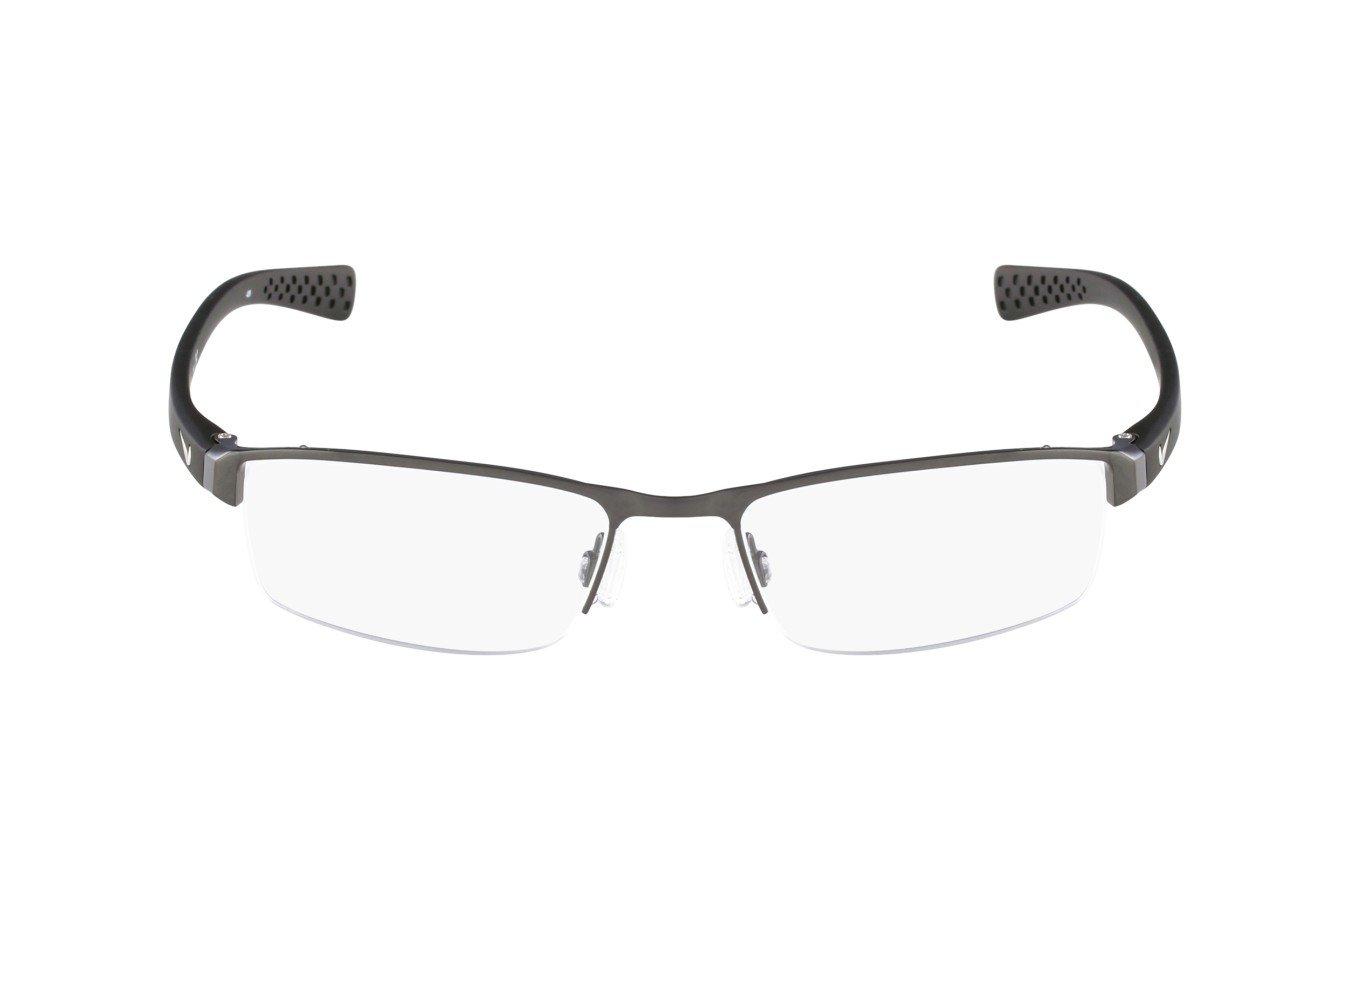 Nike Eyeglasses 8095 060 Brushed Gunmetal Demo 50 17 by NIKE